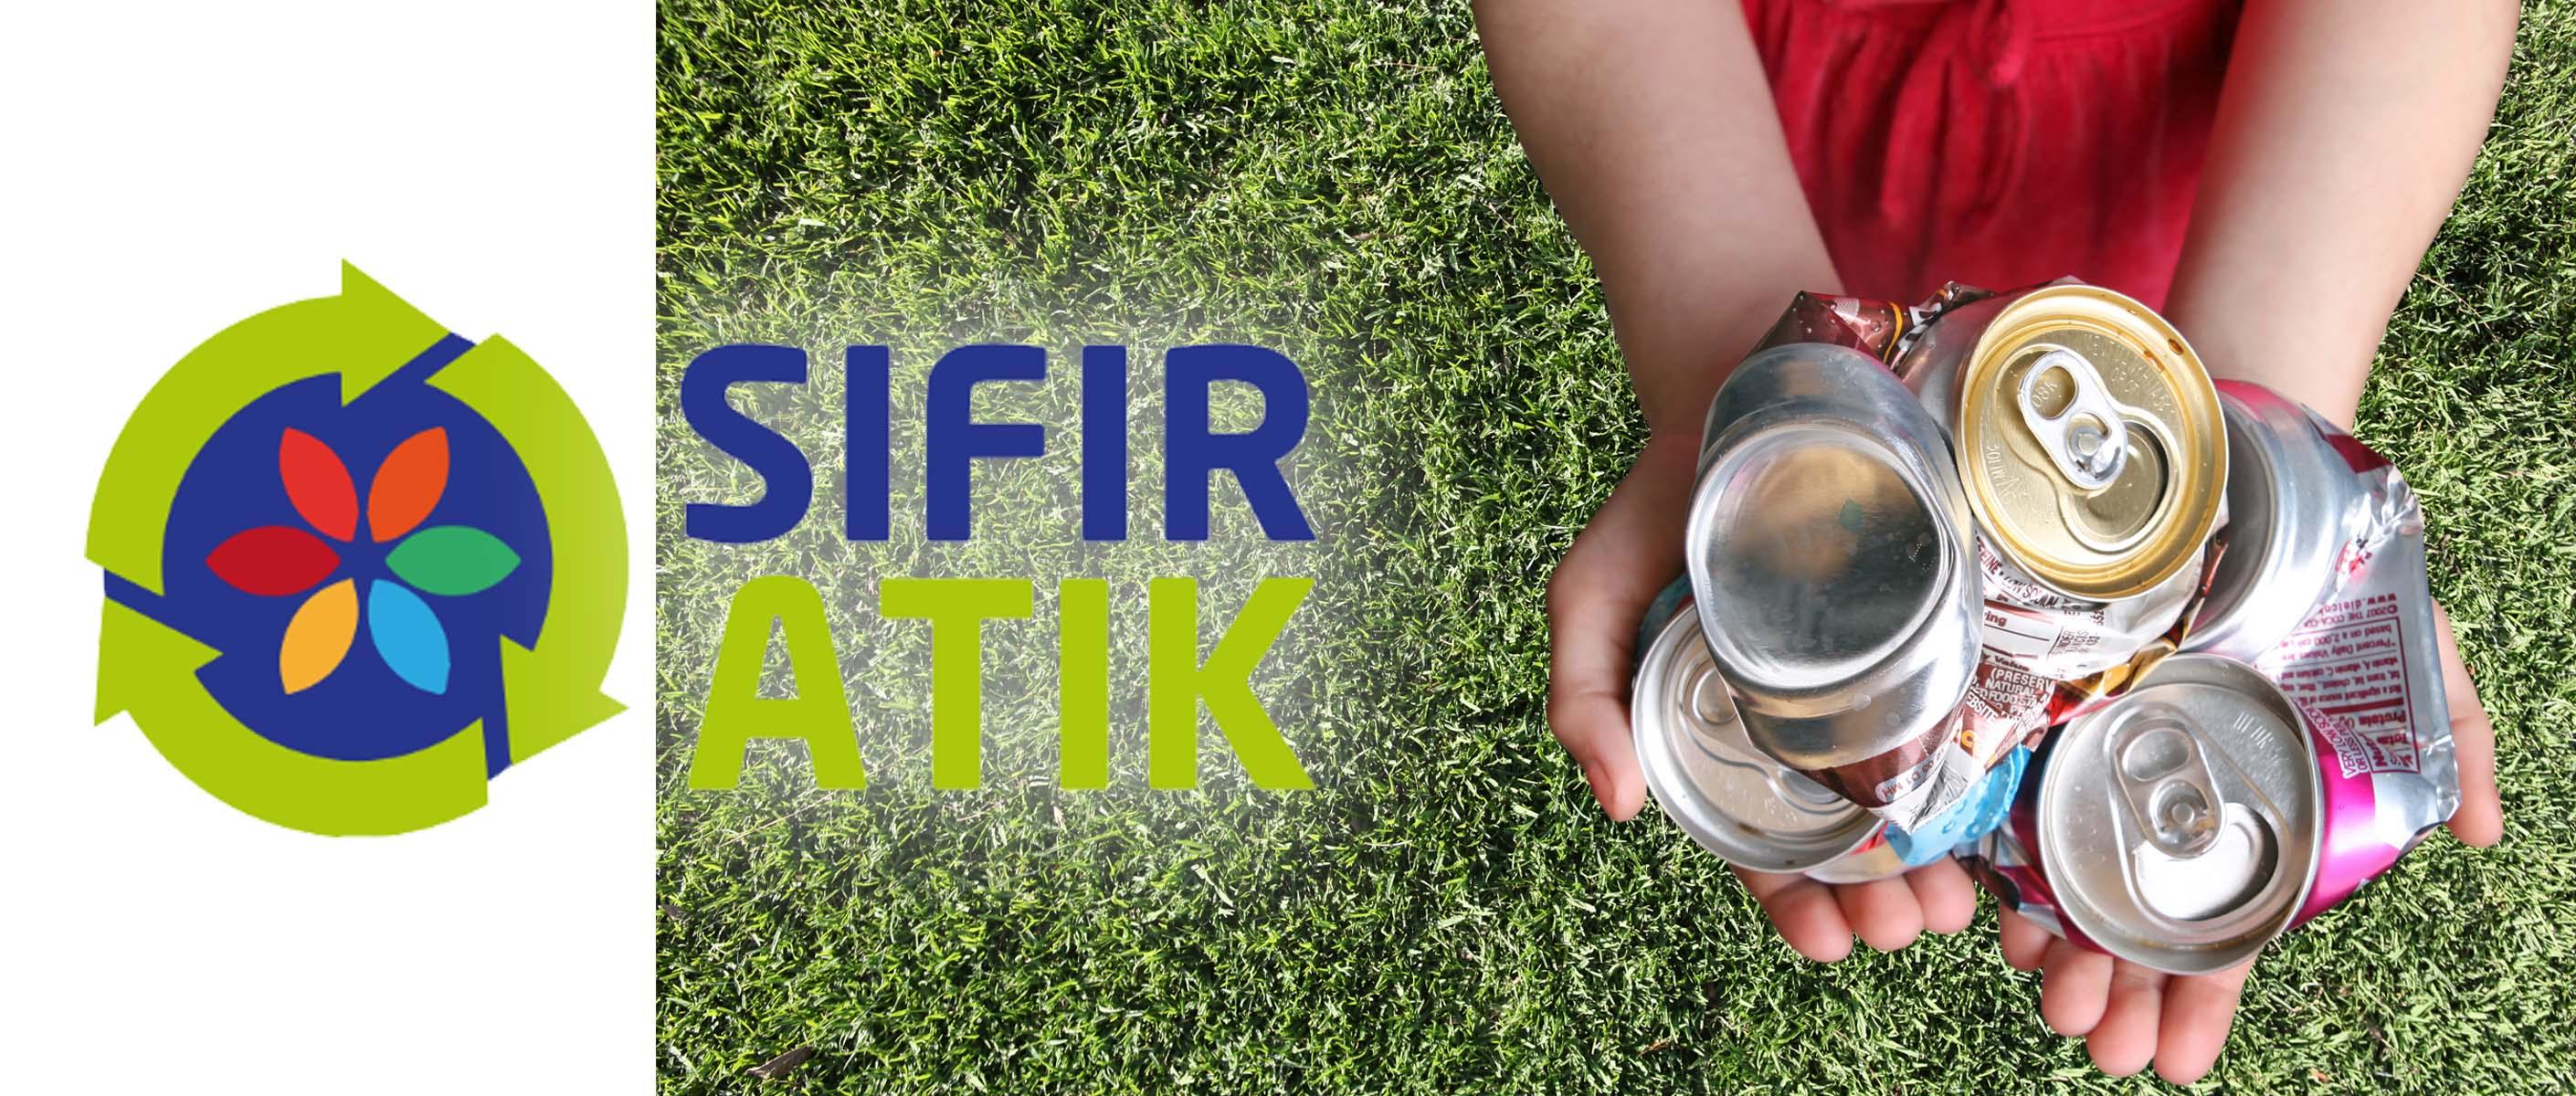 sifir_atik_yarisma_karusel